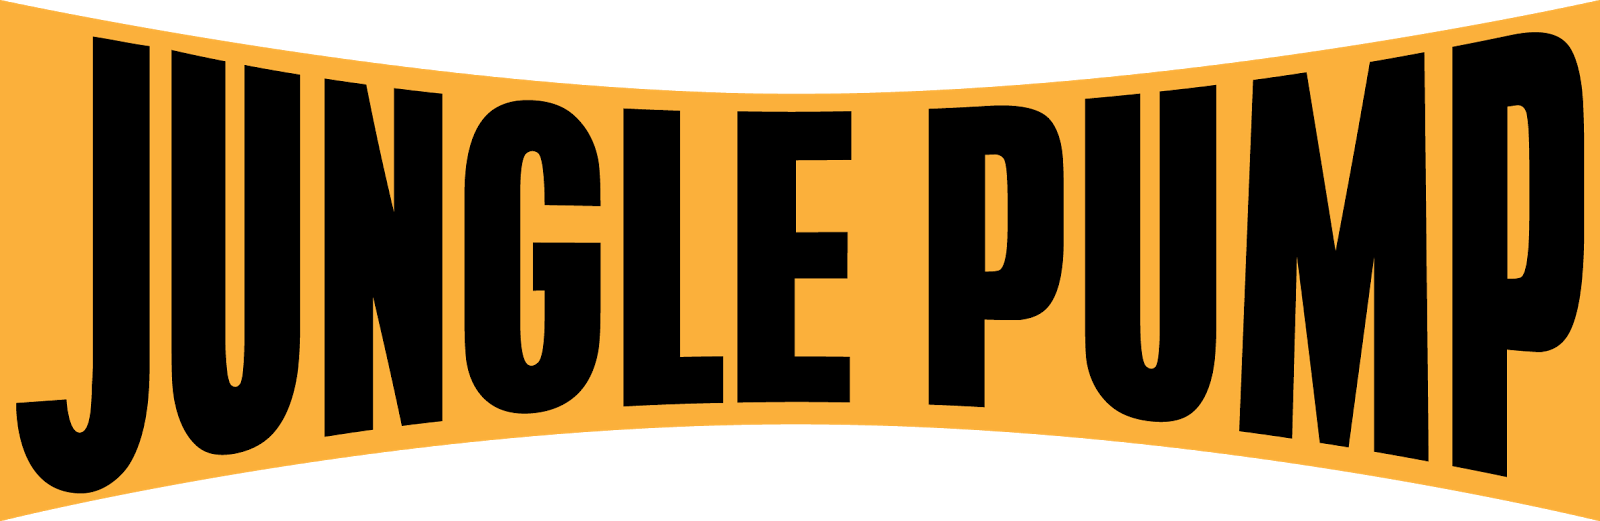 Jungle Pump fitness class logo by Sarah Pecorino for The Zoo Health Club NH